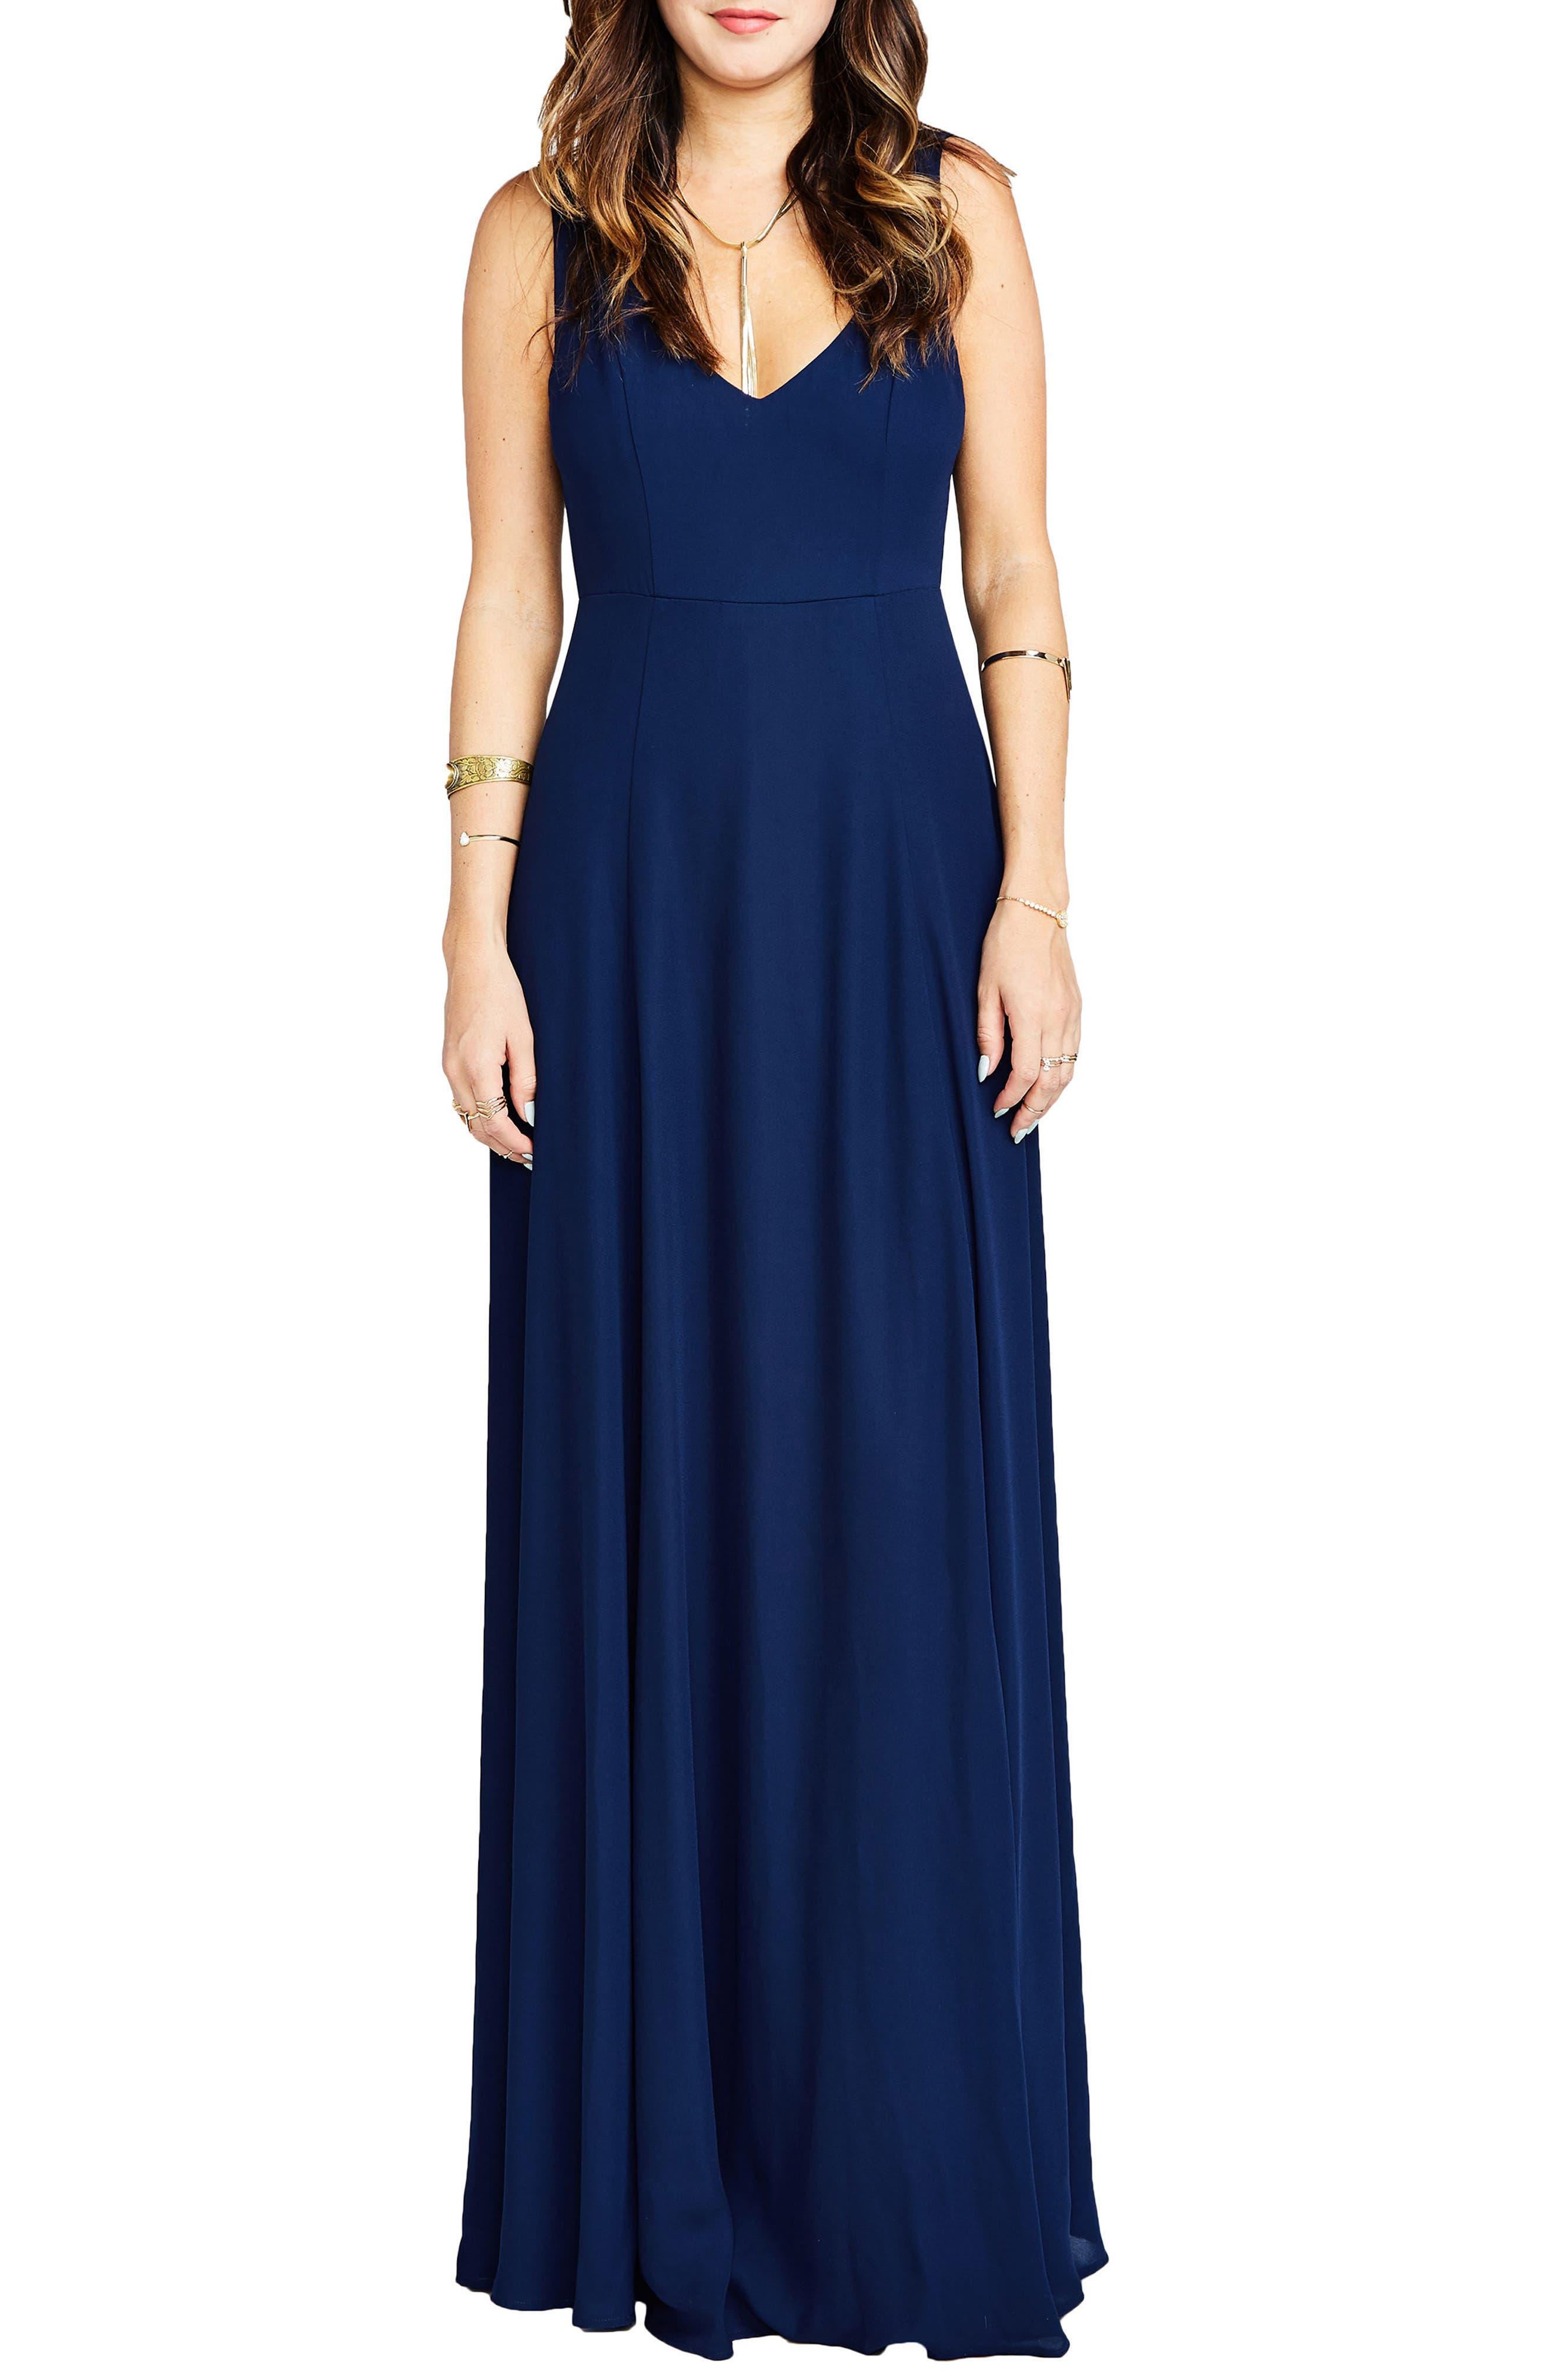 Cornflower Blue Dresses